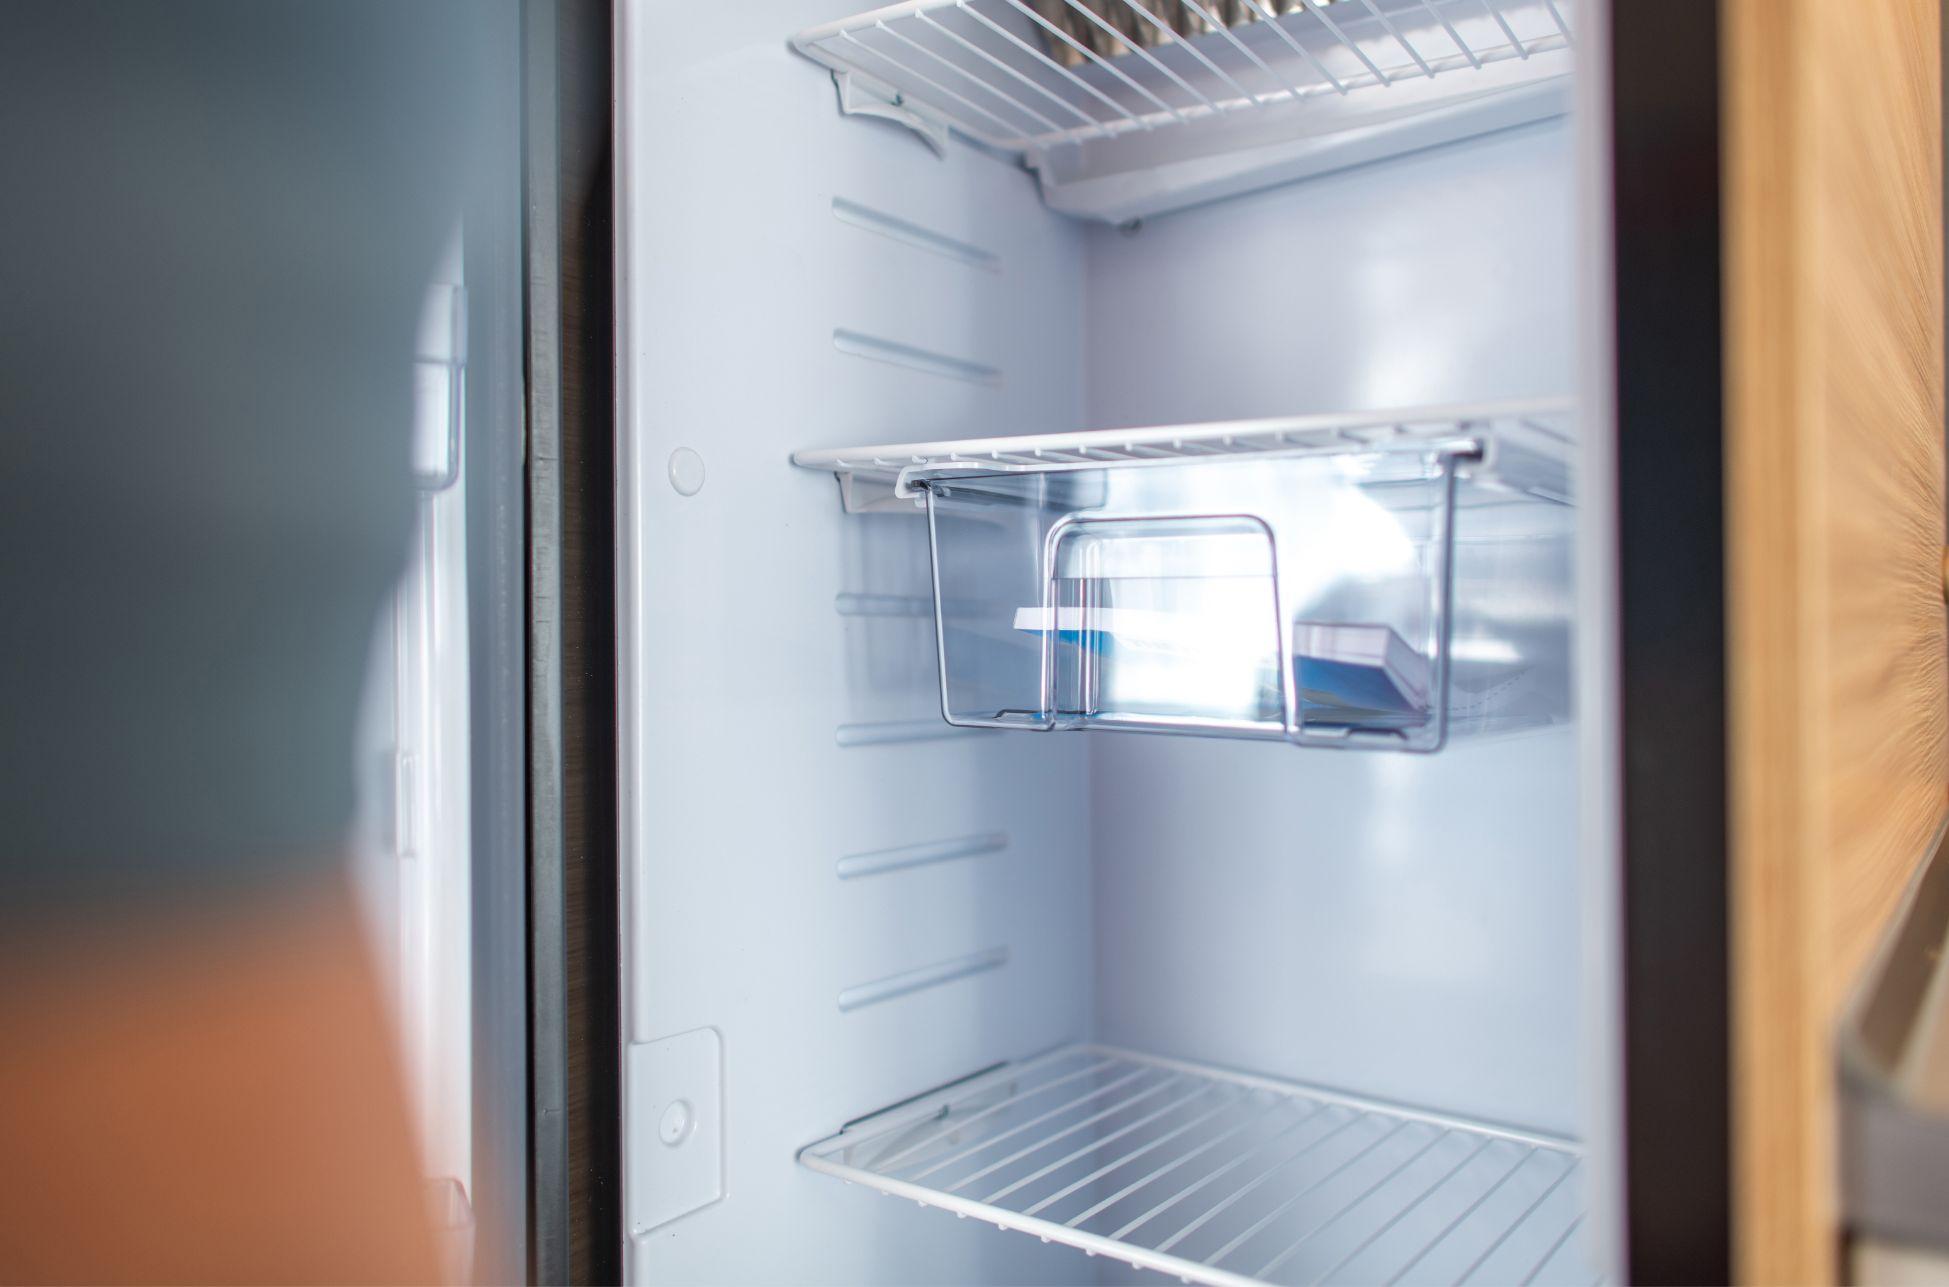 fridge freezer repair frisco tx